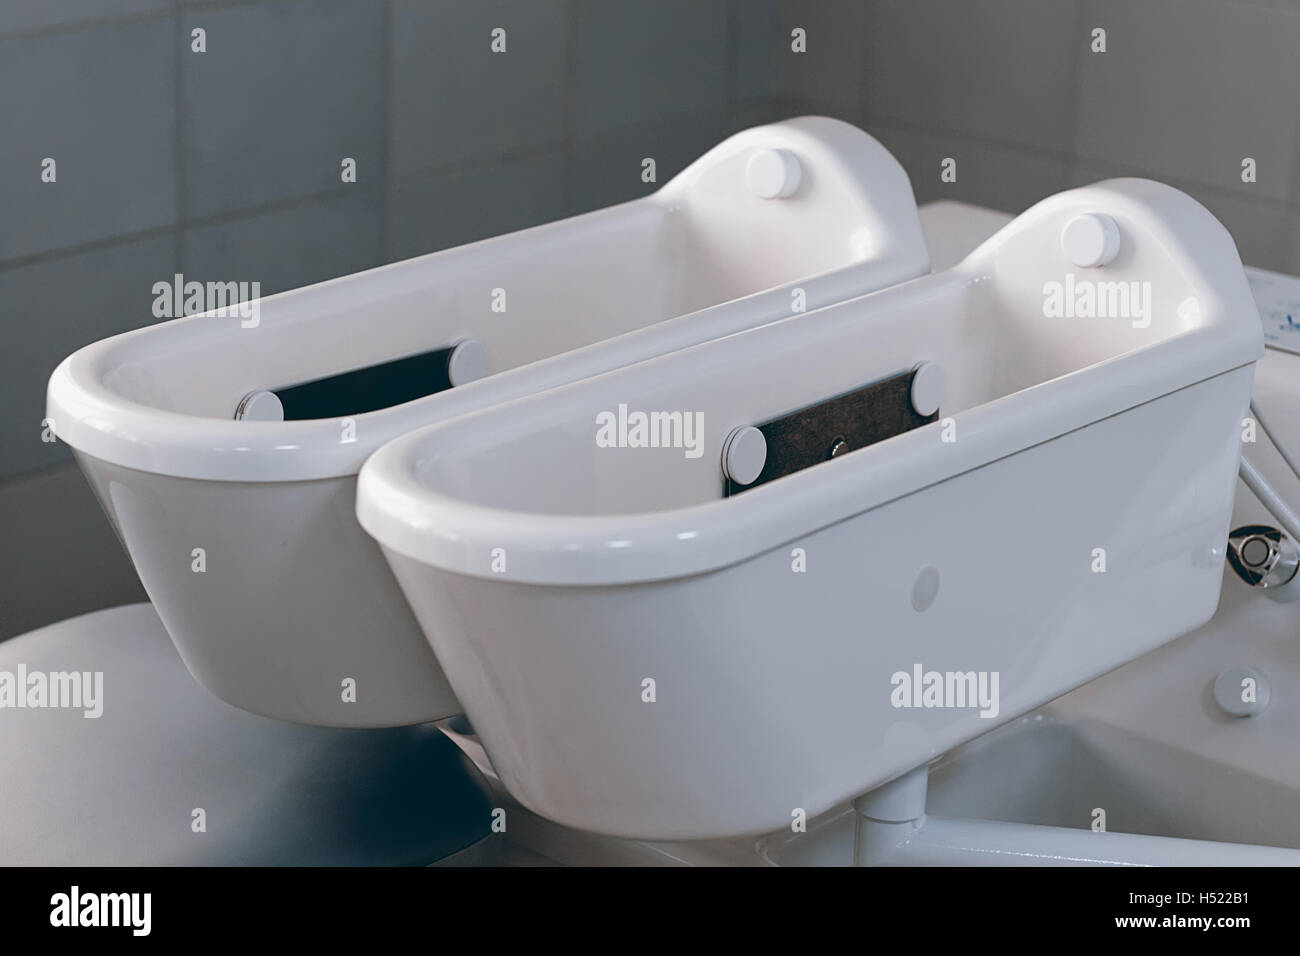 Therapy tub. Galvanic bath tub. Electrotherapy. - Stock Image